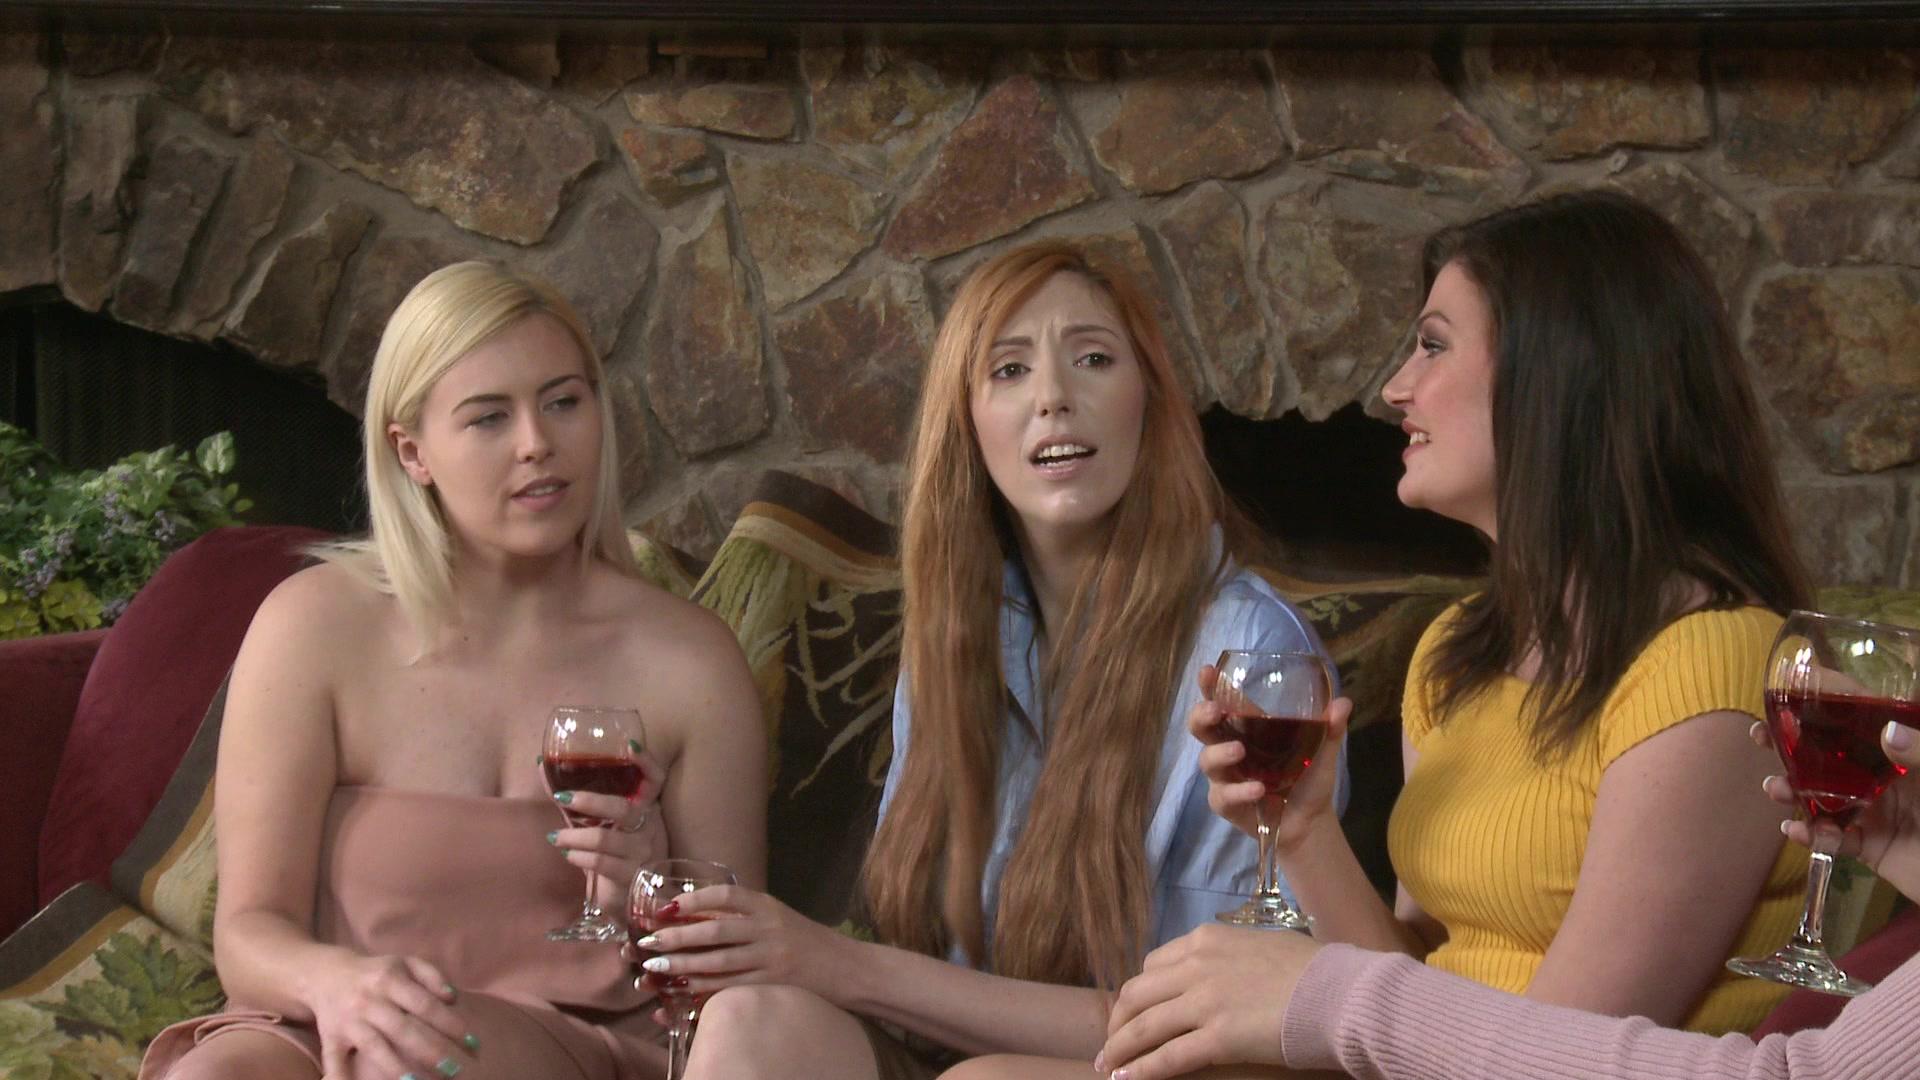 Man sulking women pussy, danielle colby crushman nude